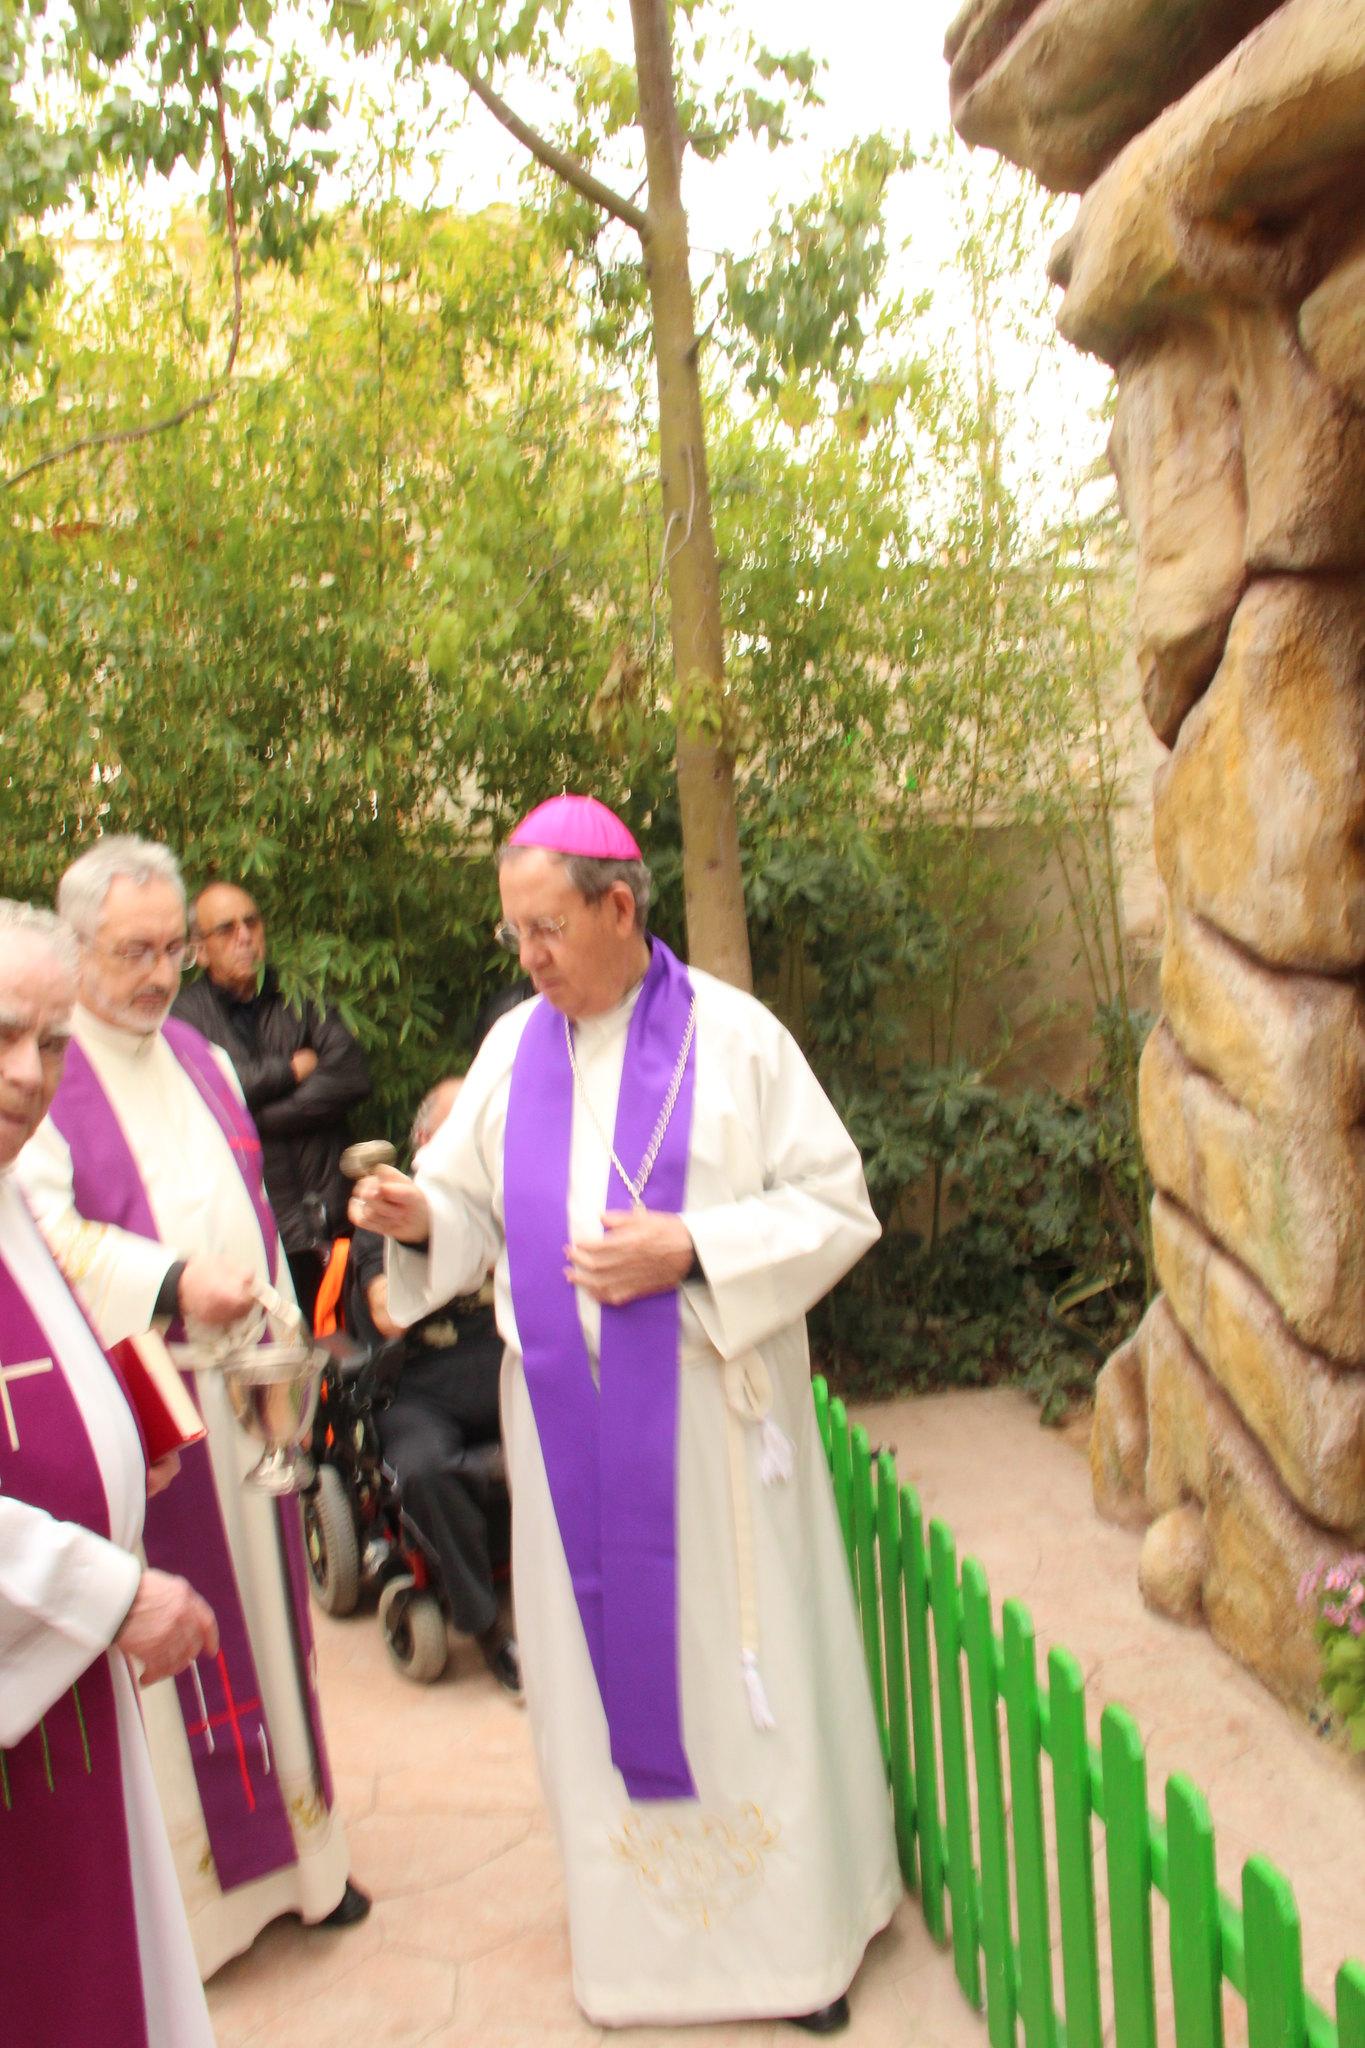 (2016-02-13) - Inauguración Virgen De Lourdes, La Molineta - Archivo La Molineta (079)